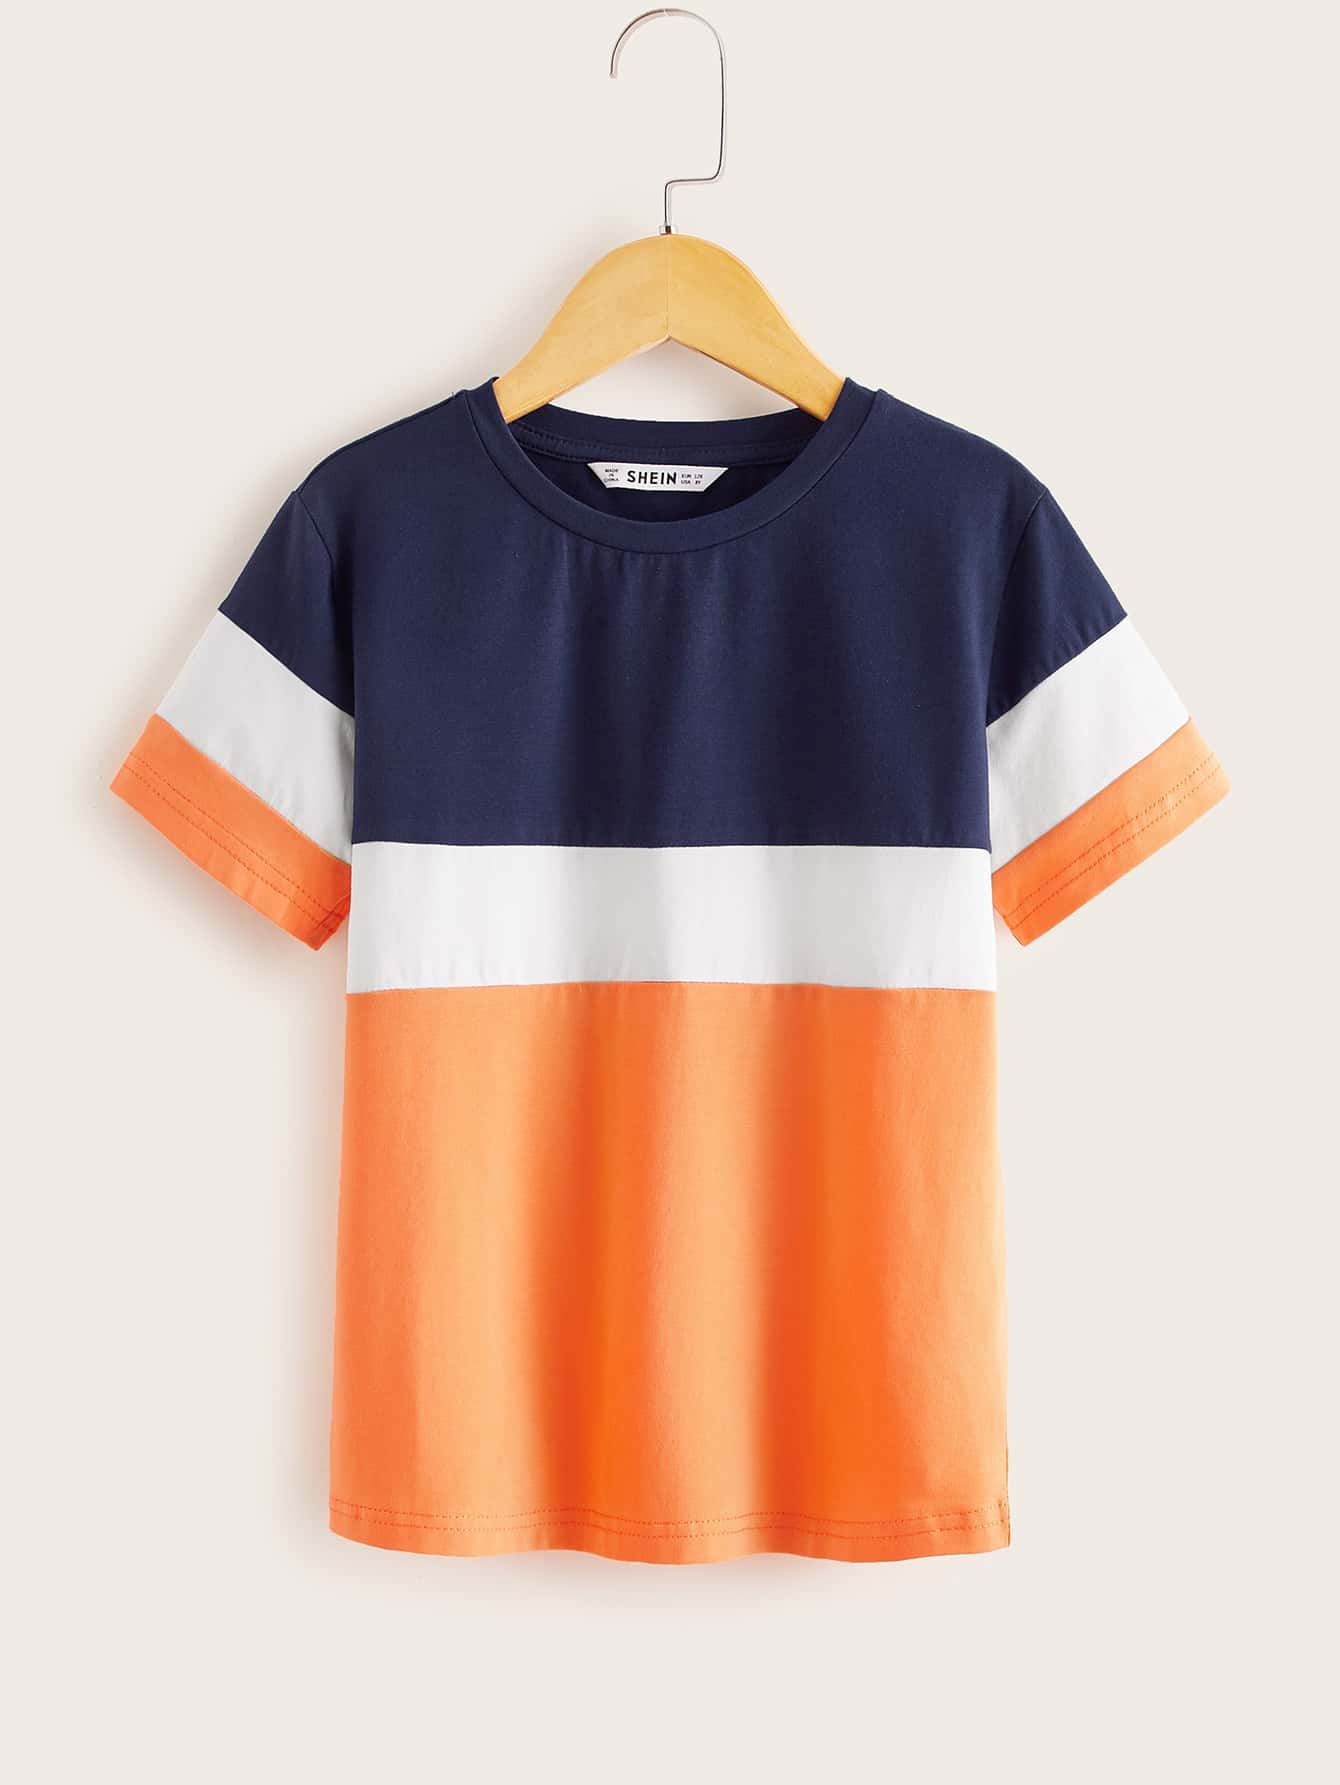 SHEIN Контрастная футболка с коротким рукавом для мальчиковsktee07200312869